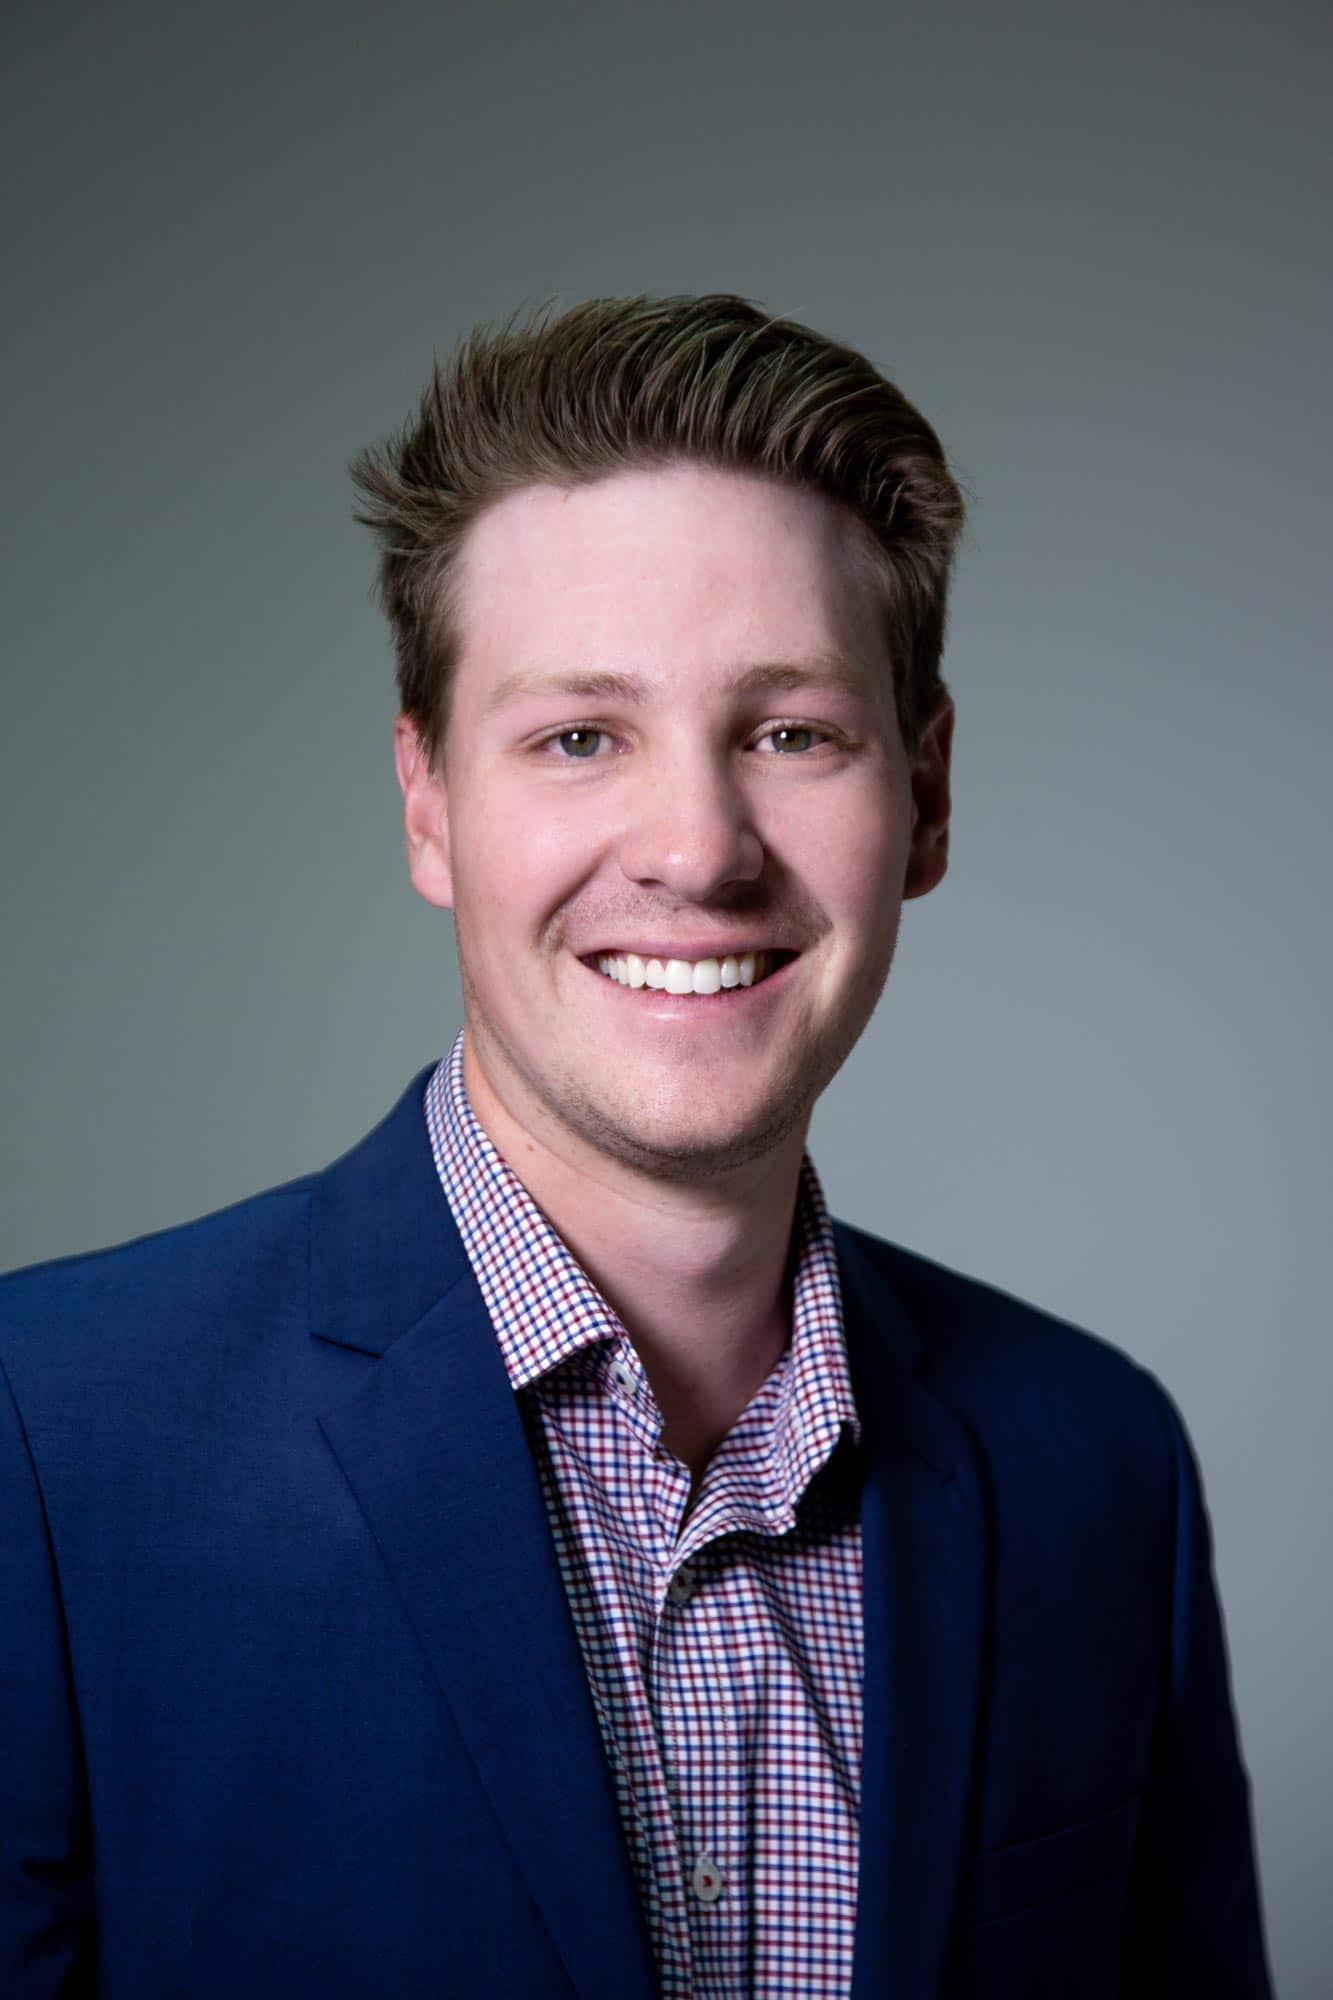 Cory Harmer